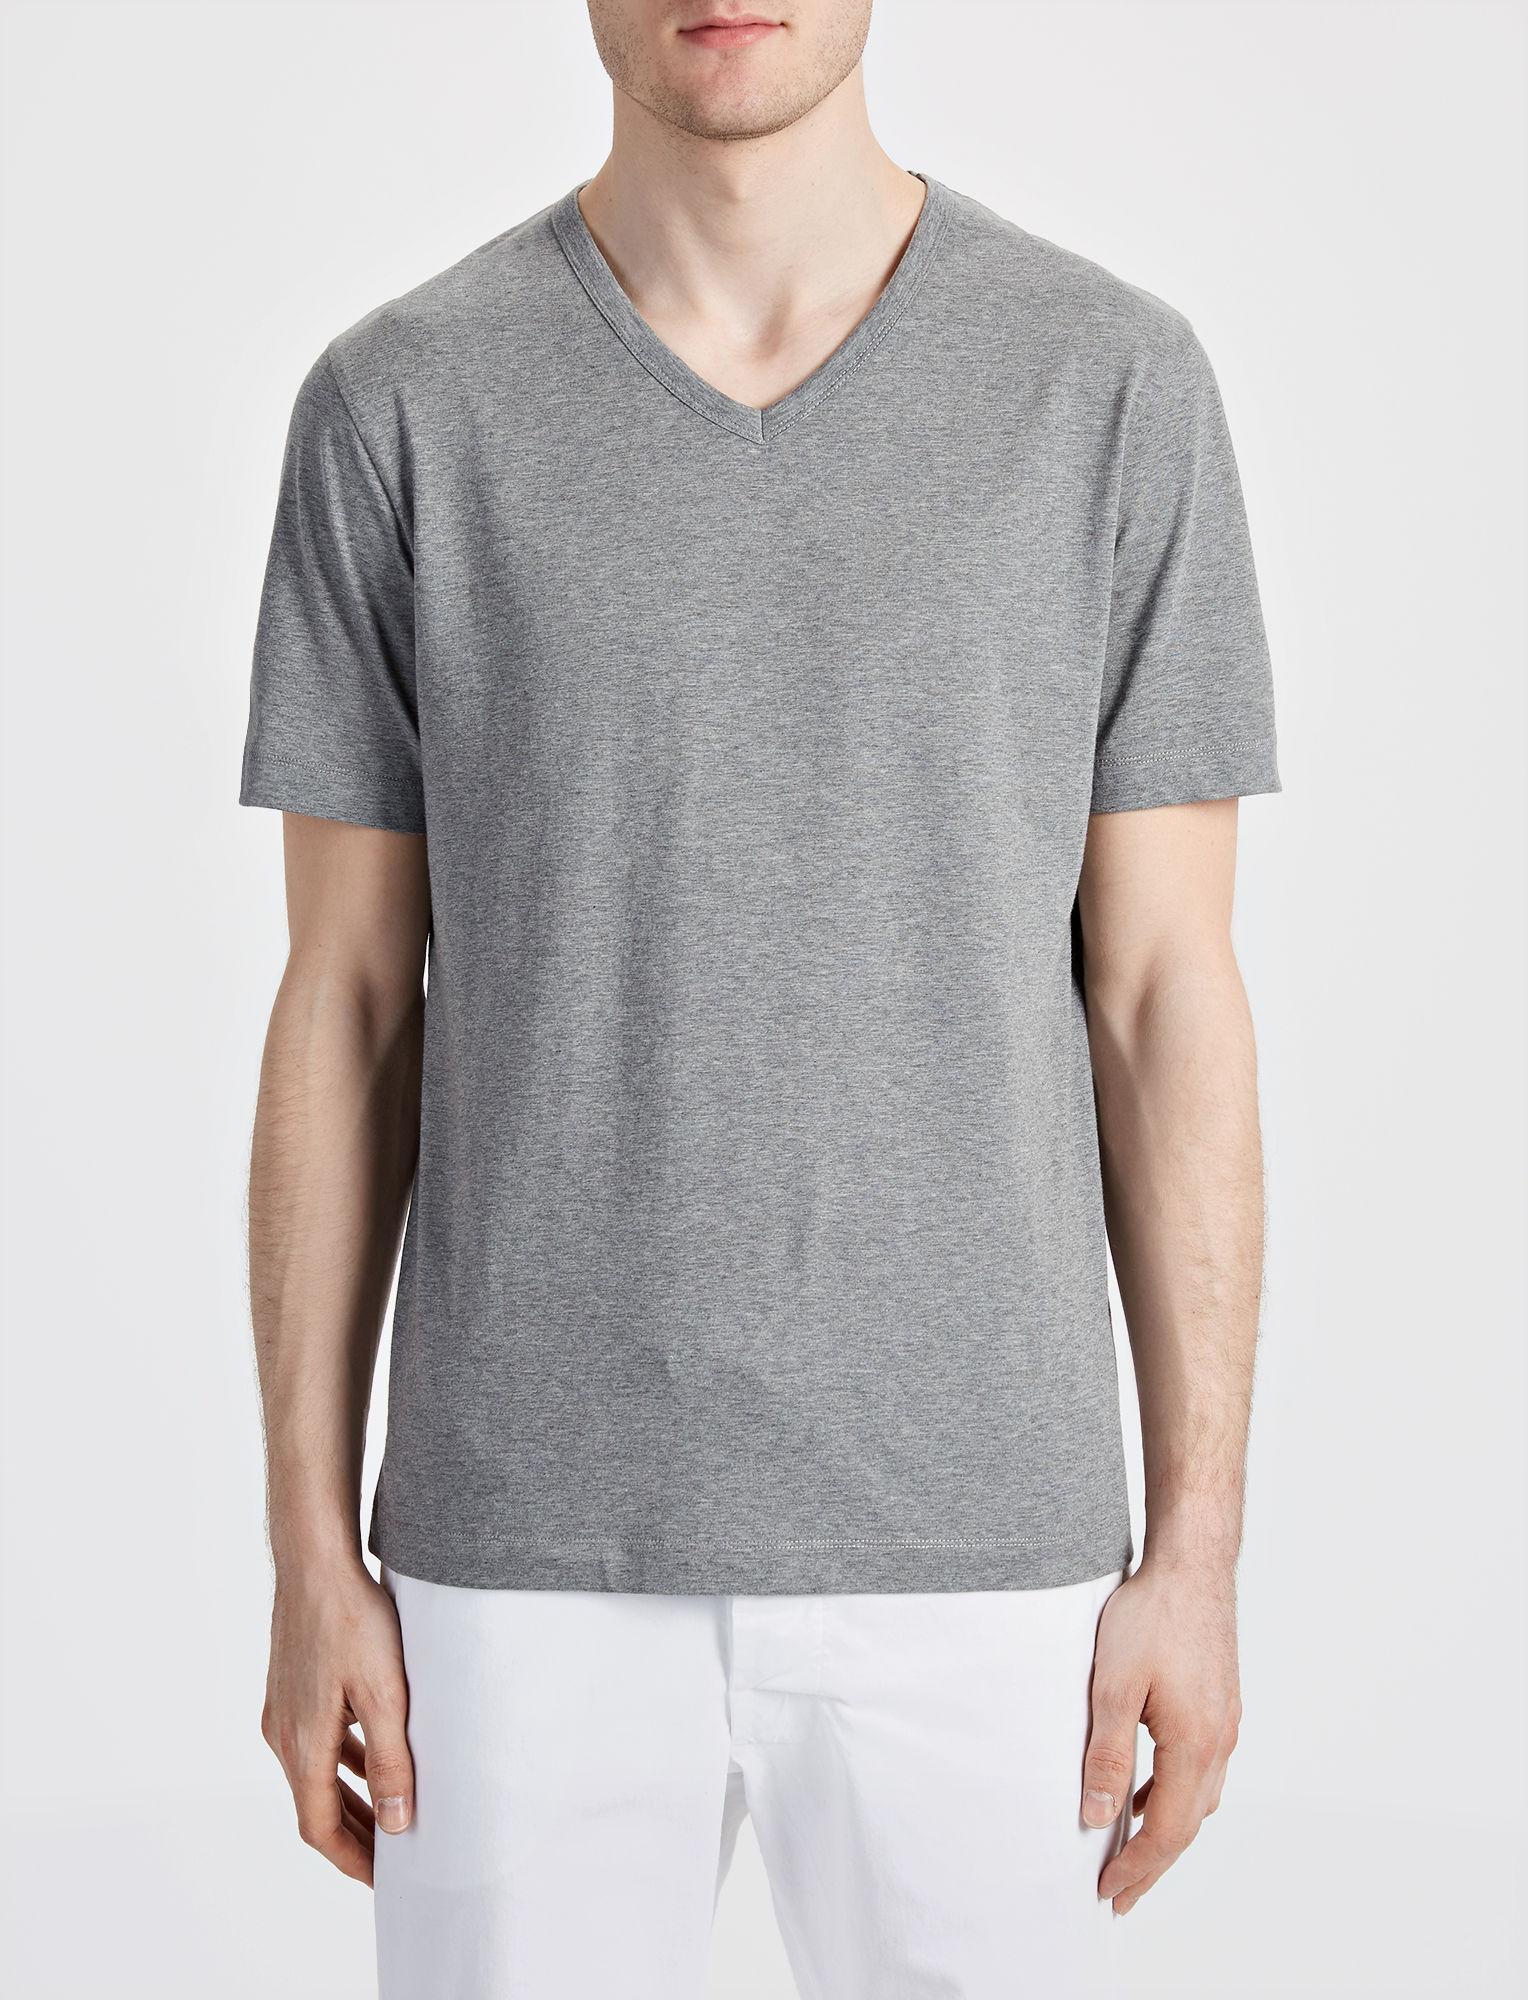 Joseph V neck Perfect jersey T-shirt bvuc7RcuQ